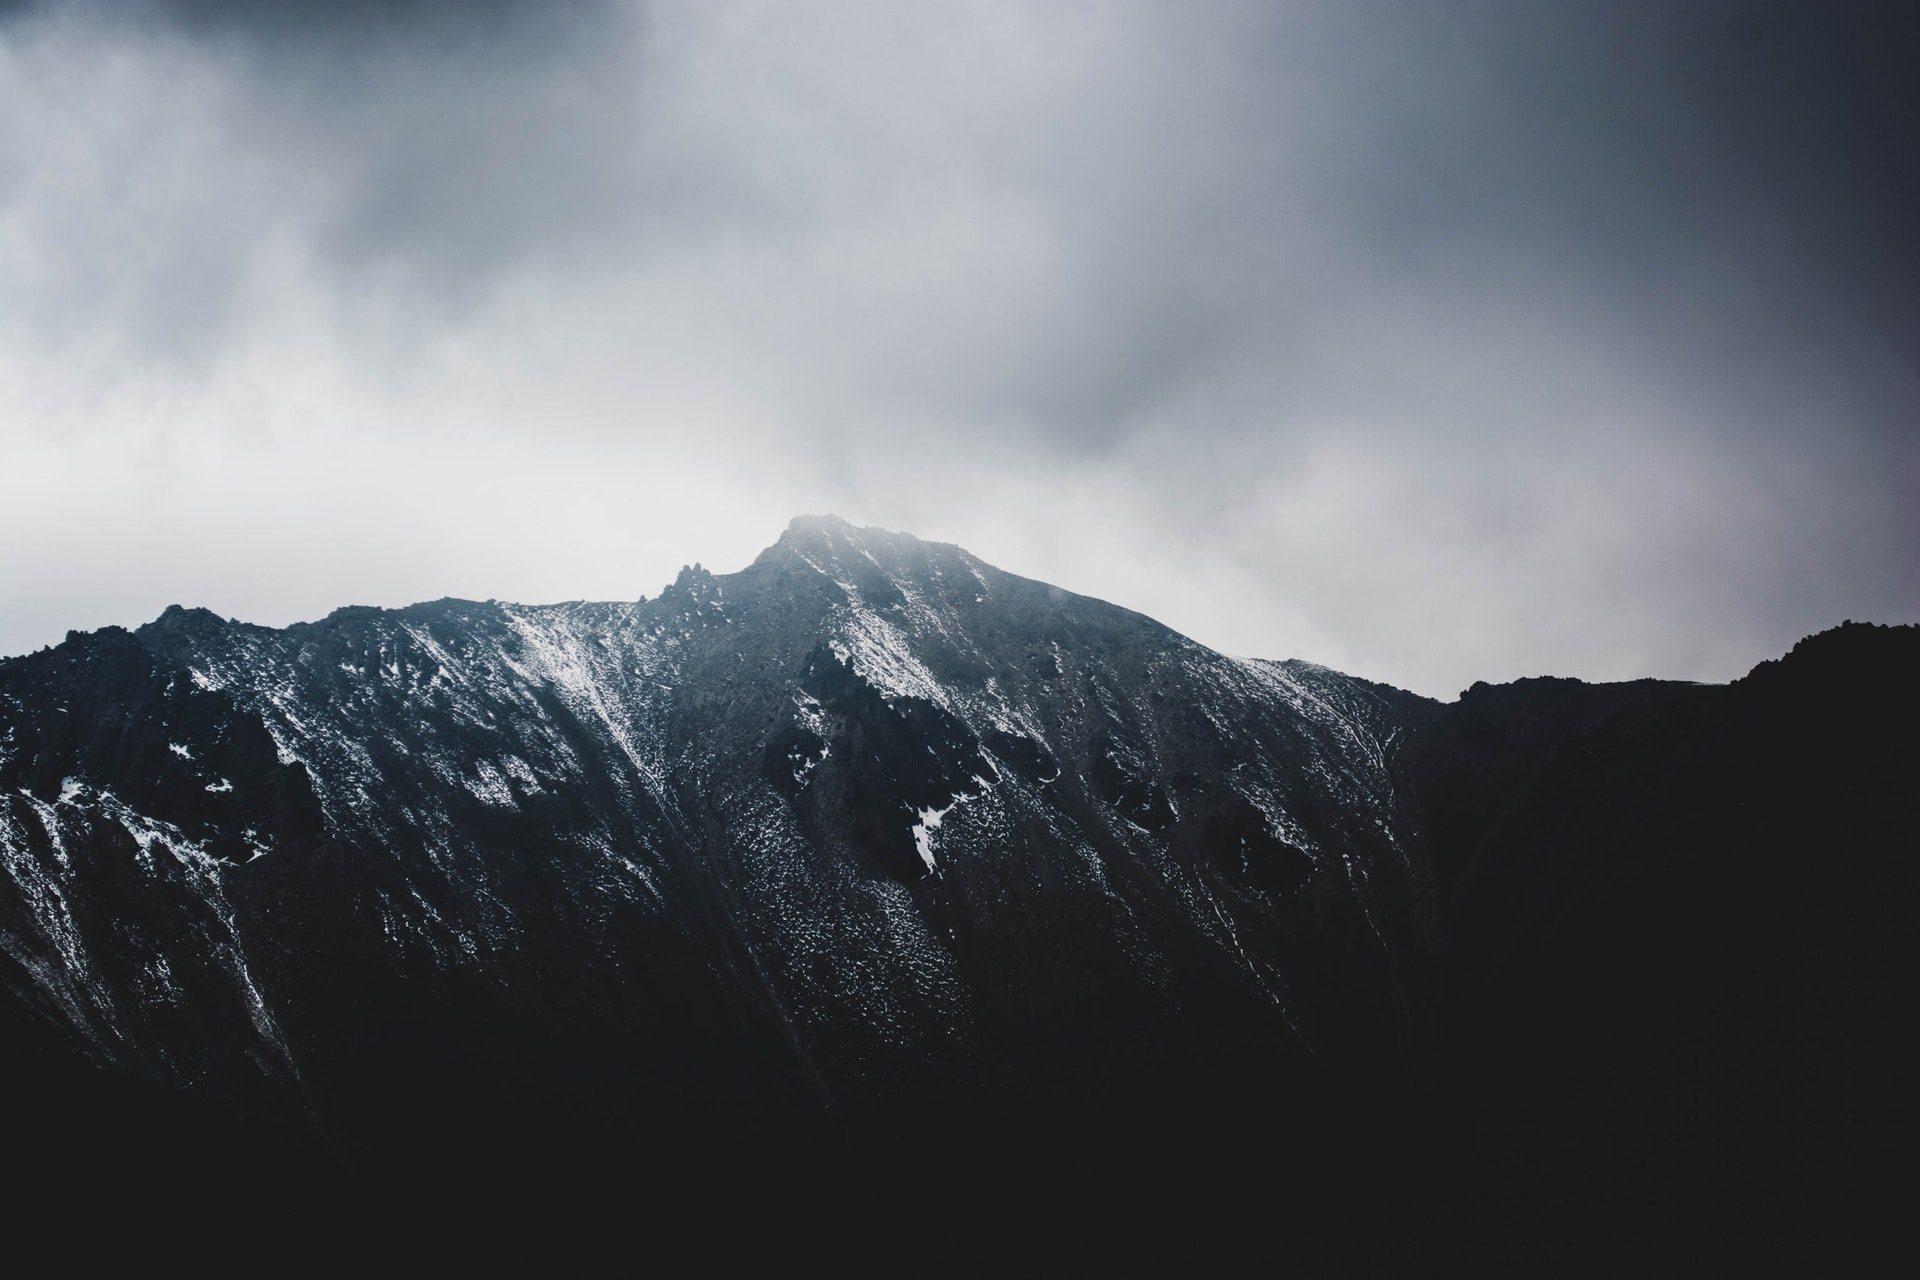 Dark Mountain Wallpapers Top Free Dark Mountain Backgrounds